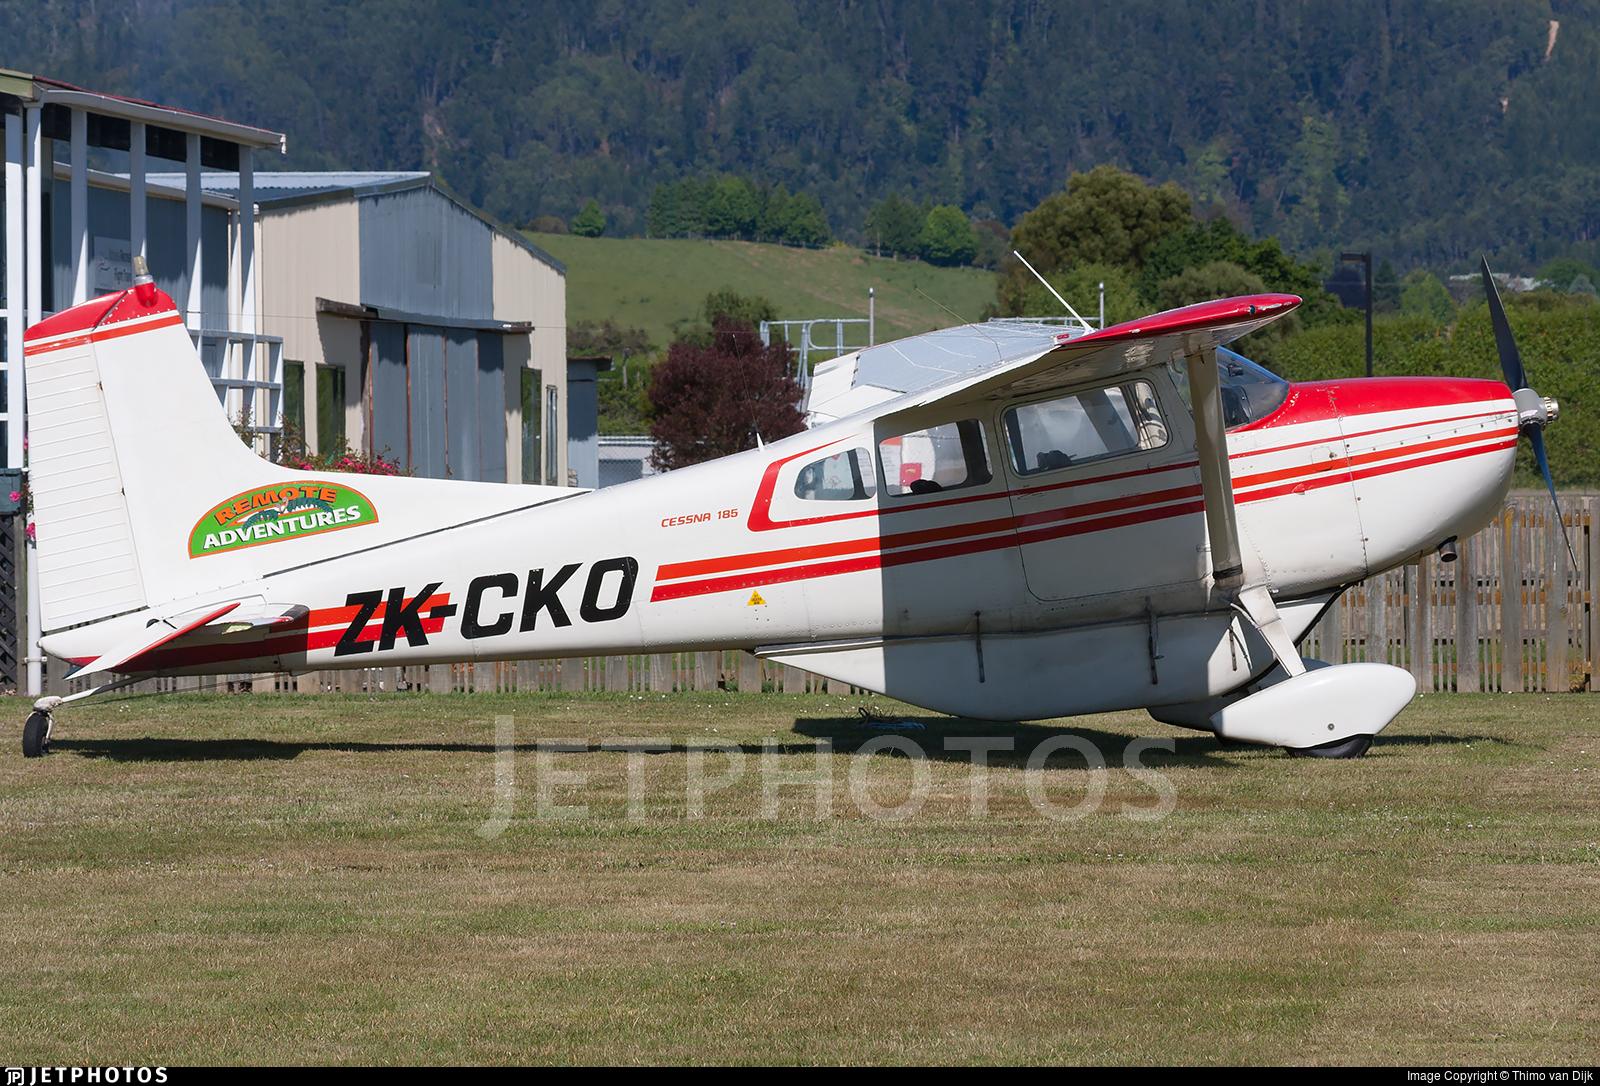 ZK-CKO - Cessna 185D Skywagon - Remote Adventures